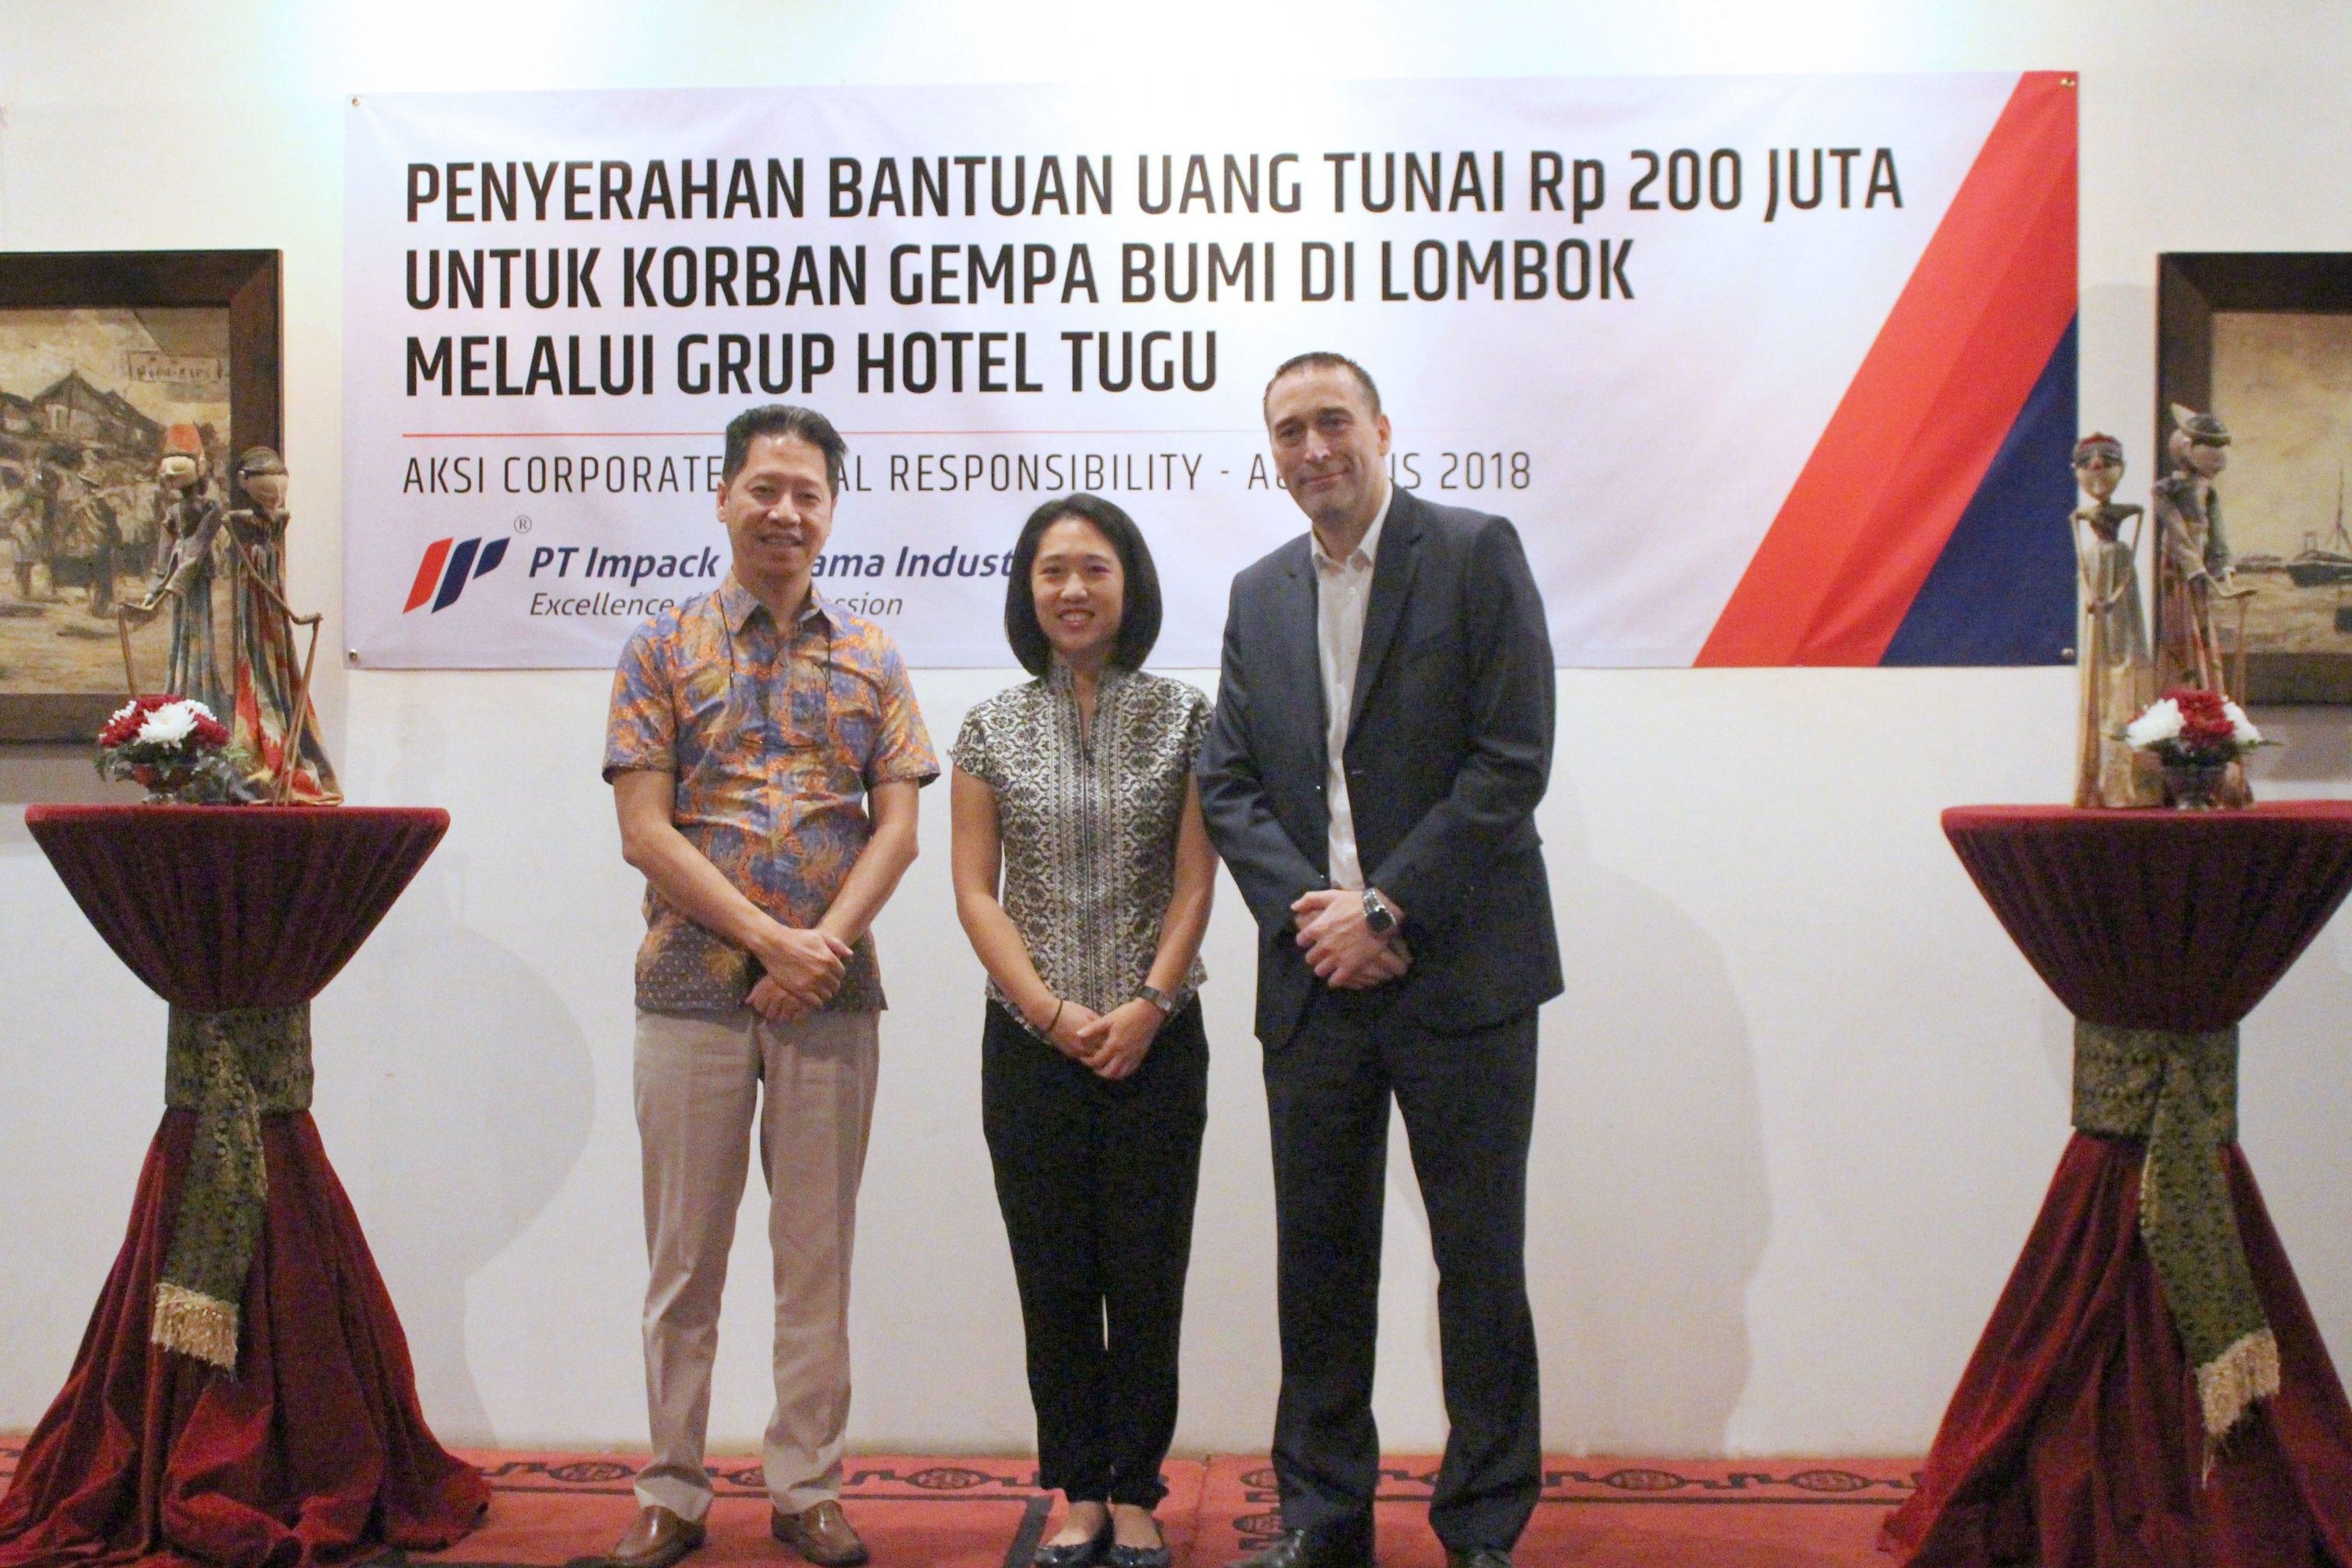 CSR Impack Group Penyerahan Bantuan Uang Tunai Rp 200 juta Lombok 2018